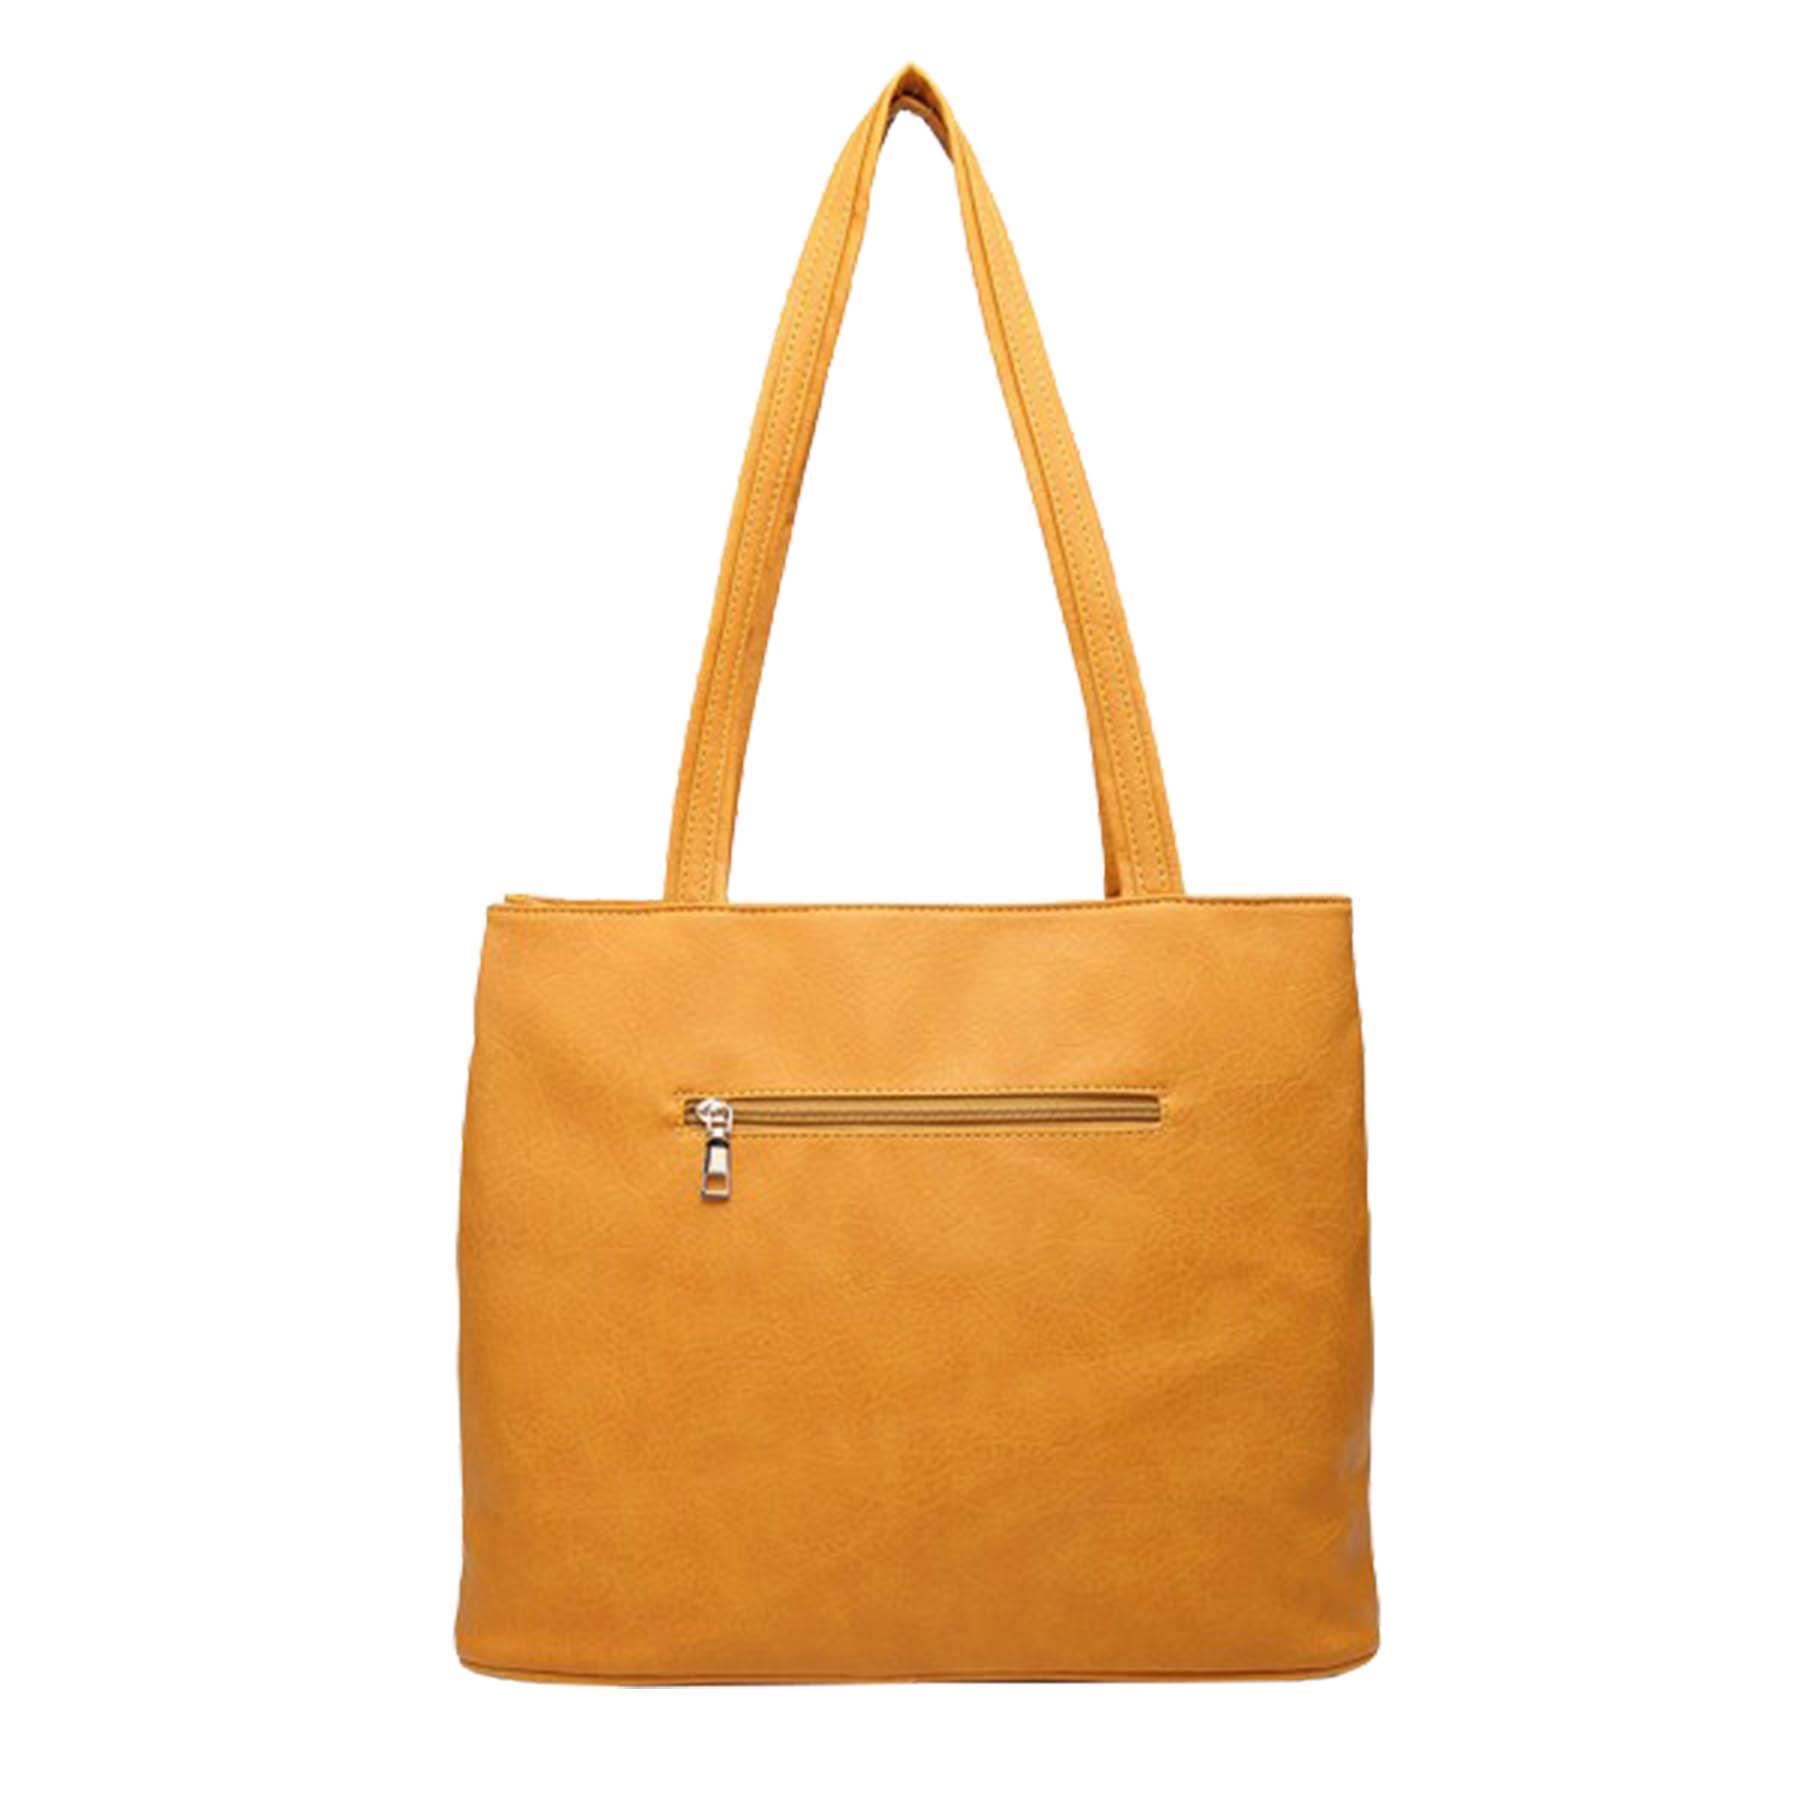 New-Casual-Ladies-Work-Double-Compartment-Metallic-Detail-Shoulder-Bag thumbnail 9